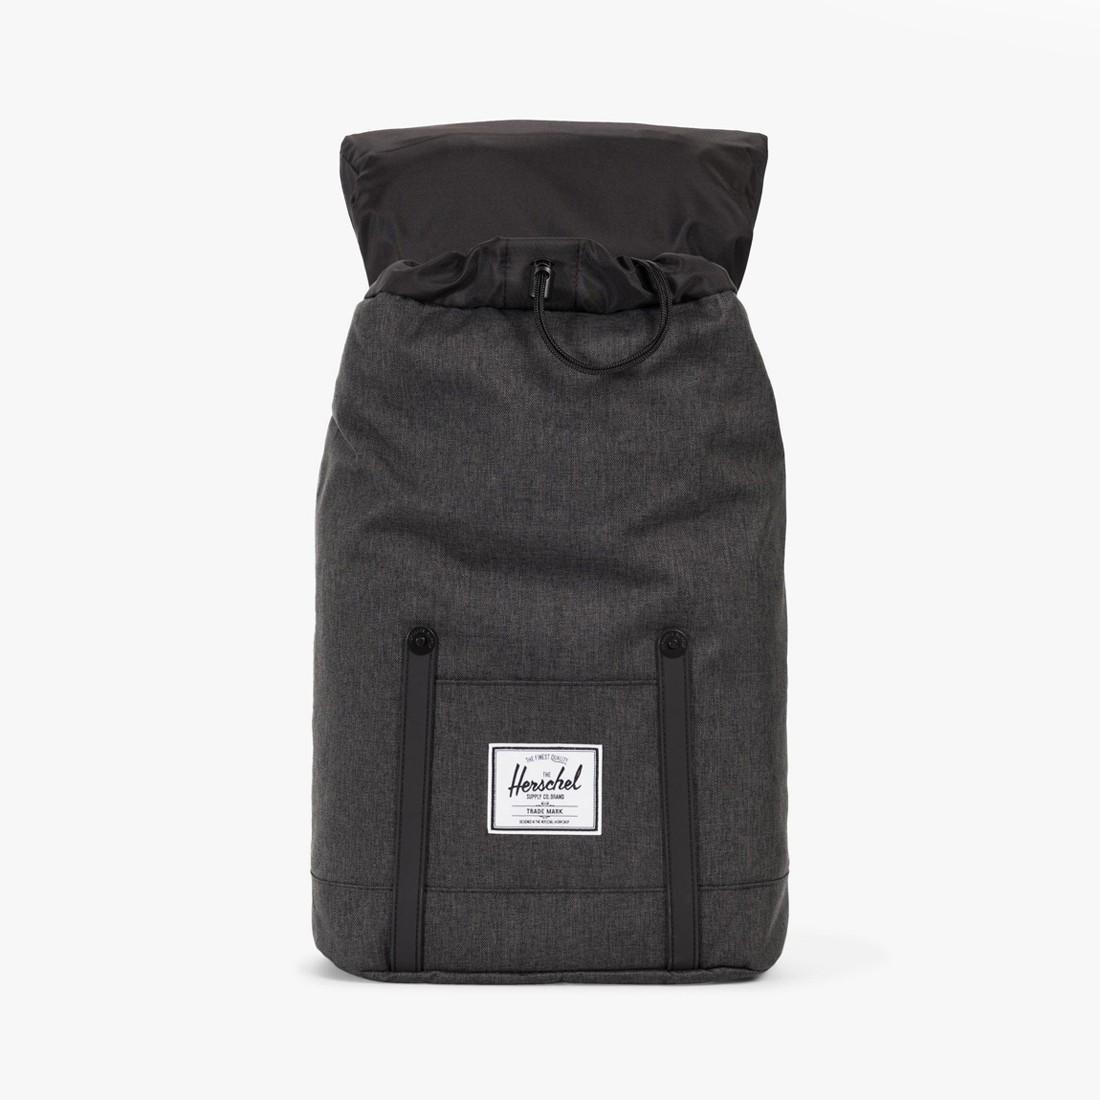 Retreat Backpack Black Crosshatch 23b9d8cade582